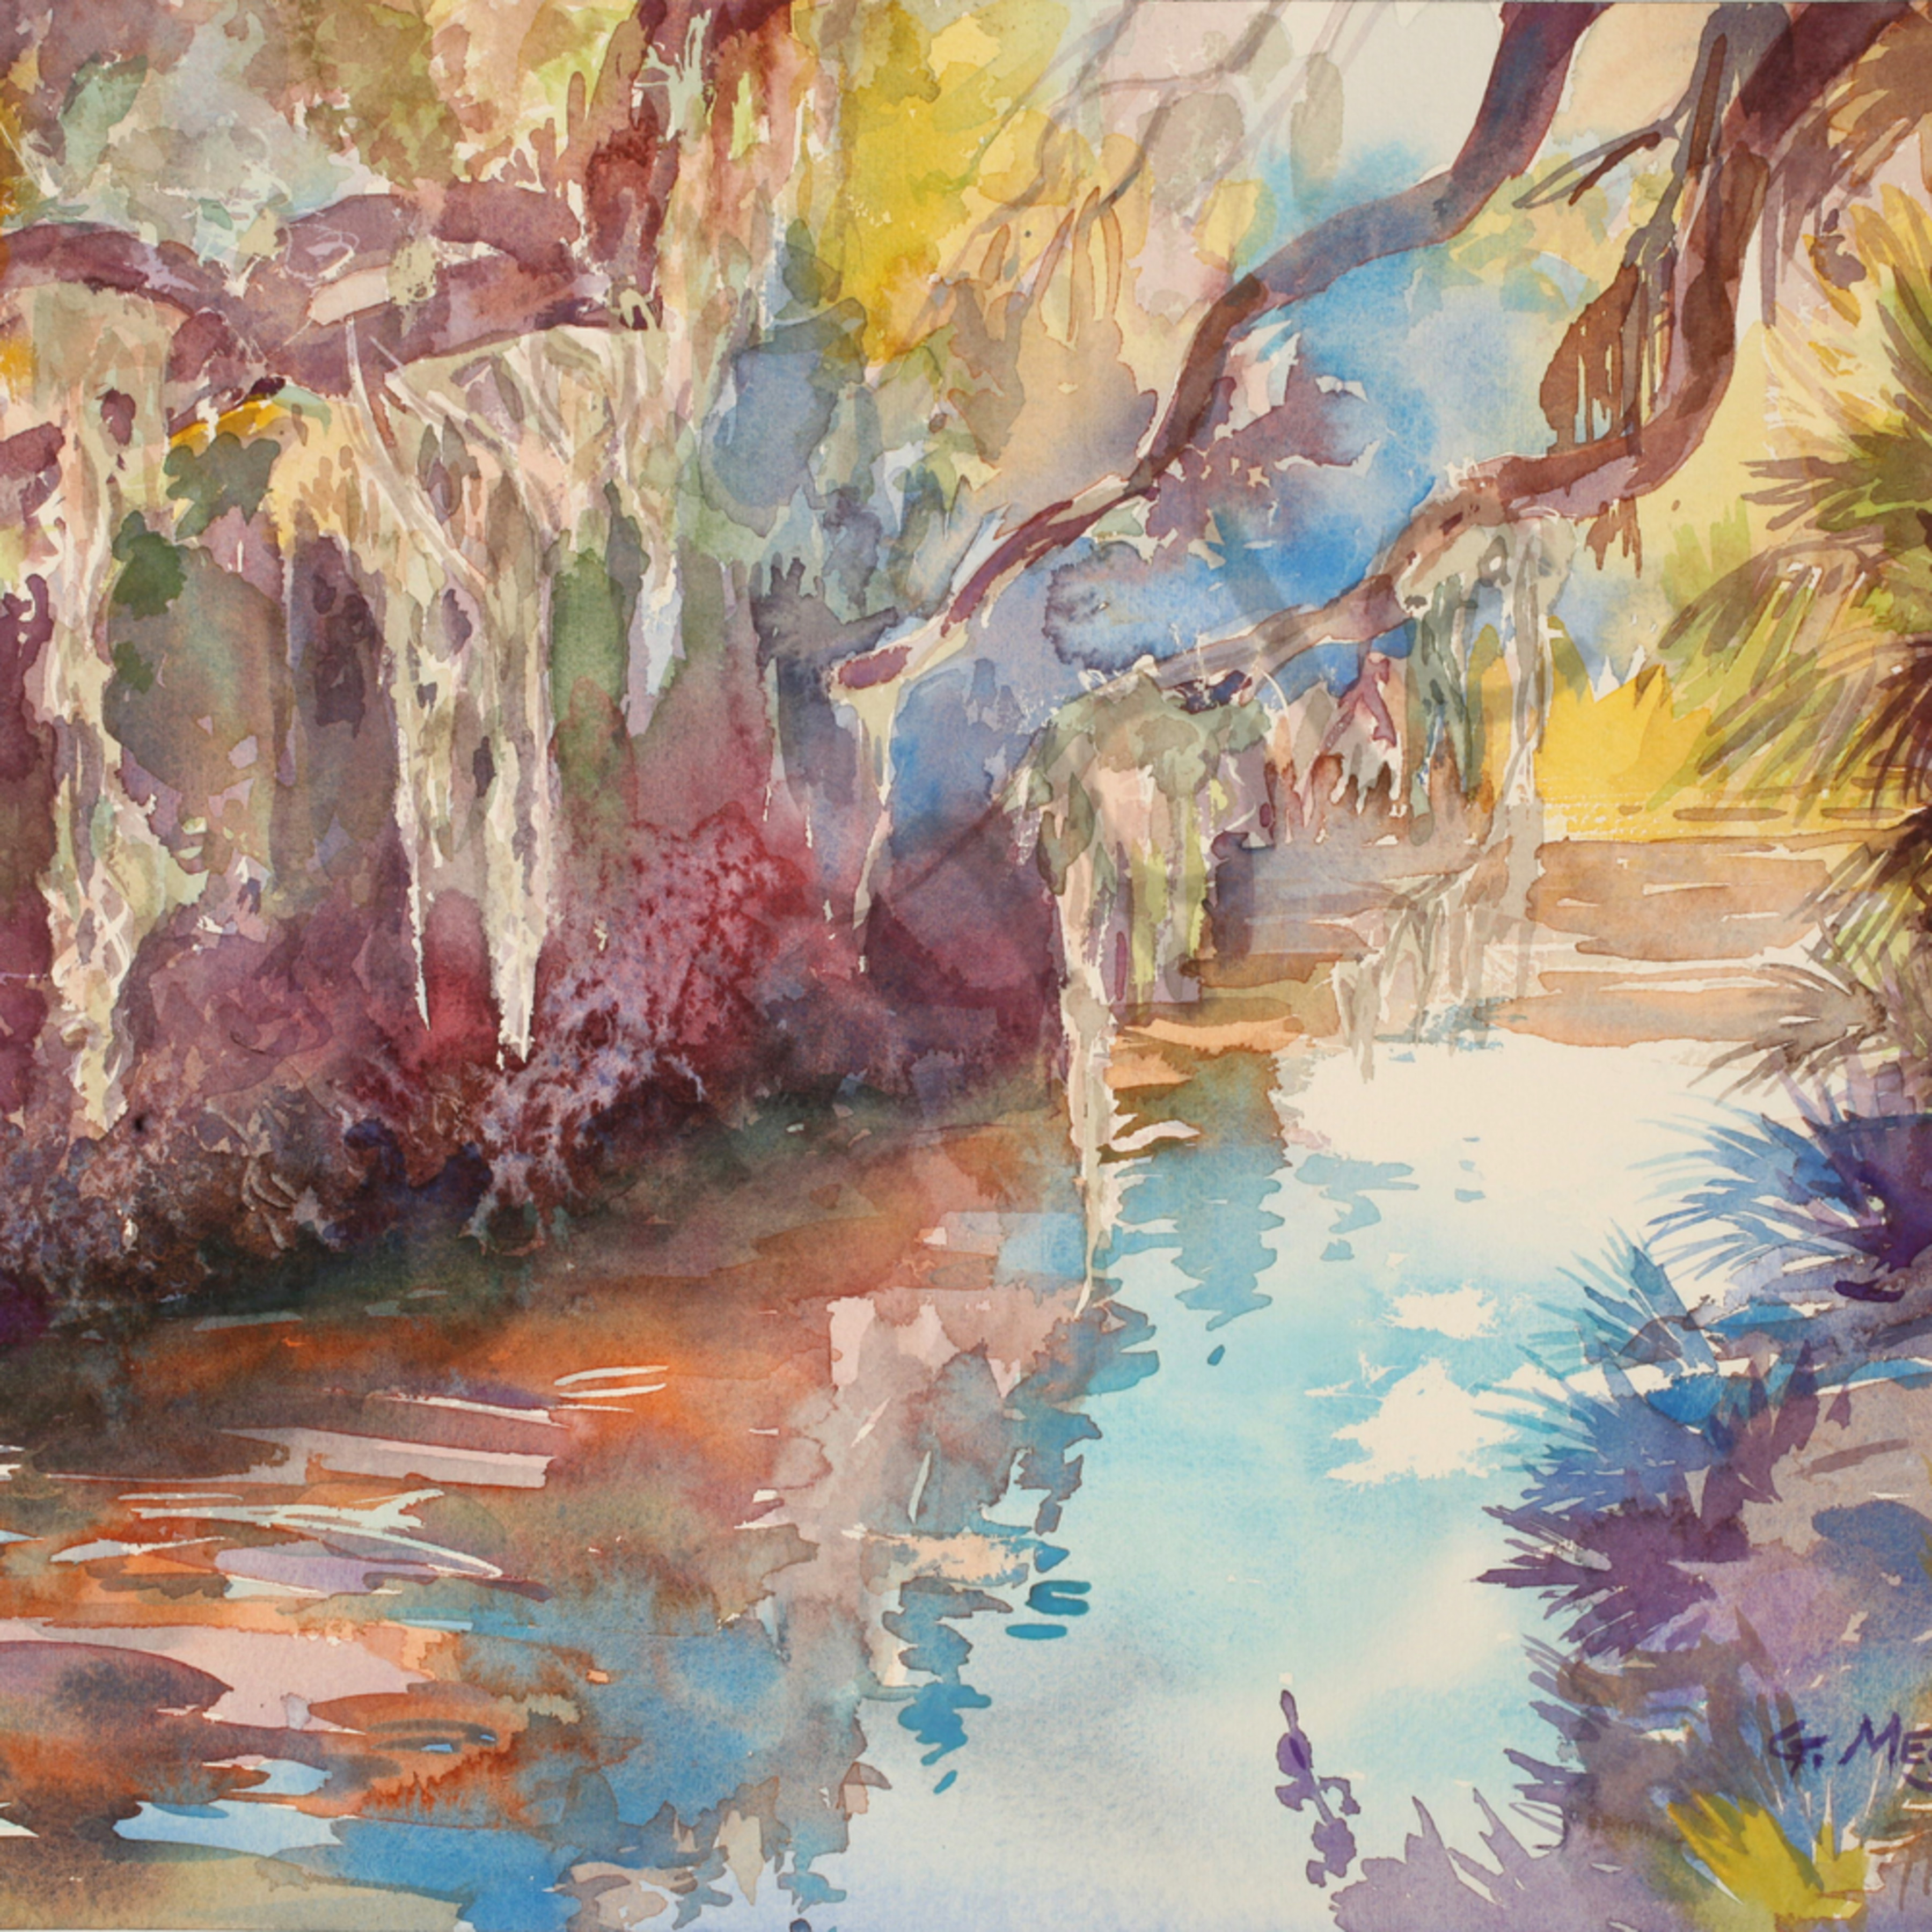 Matanzas river 16 x 12 watercolor landscapes bhs2vj